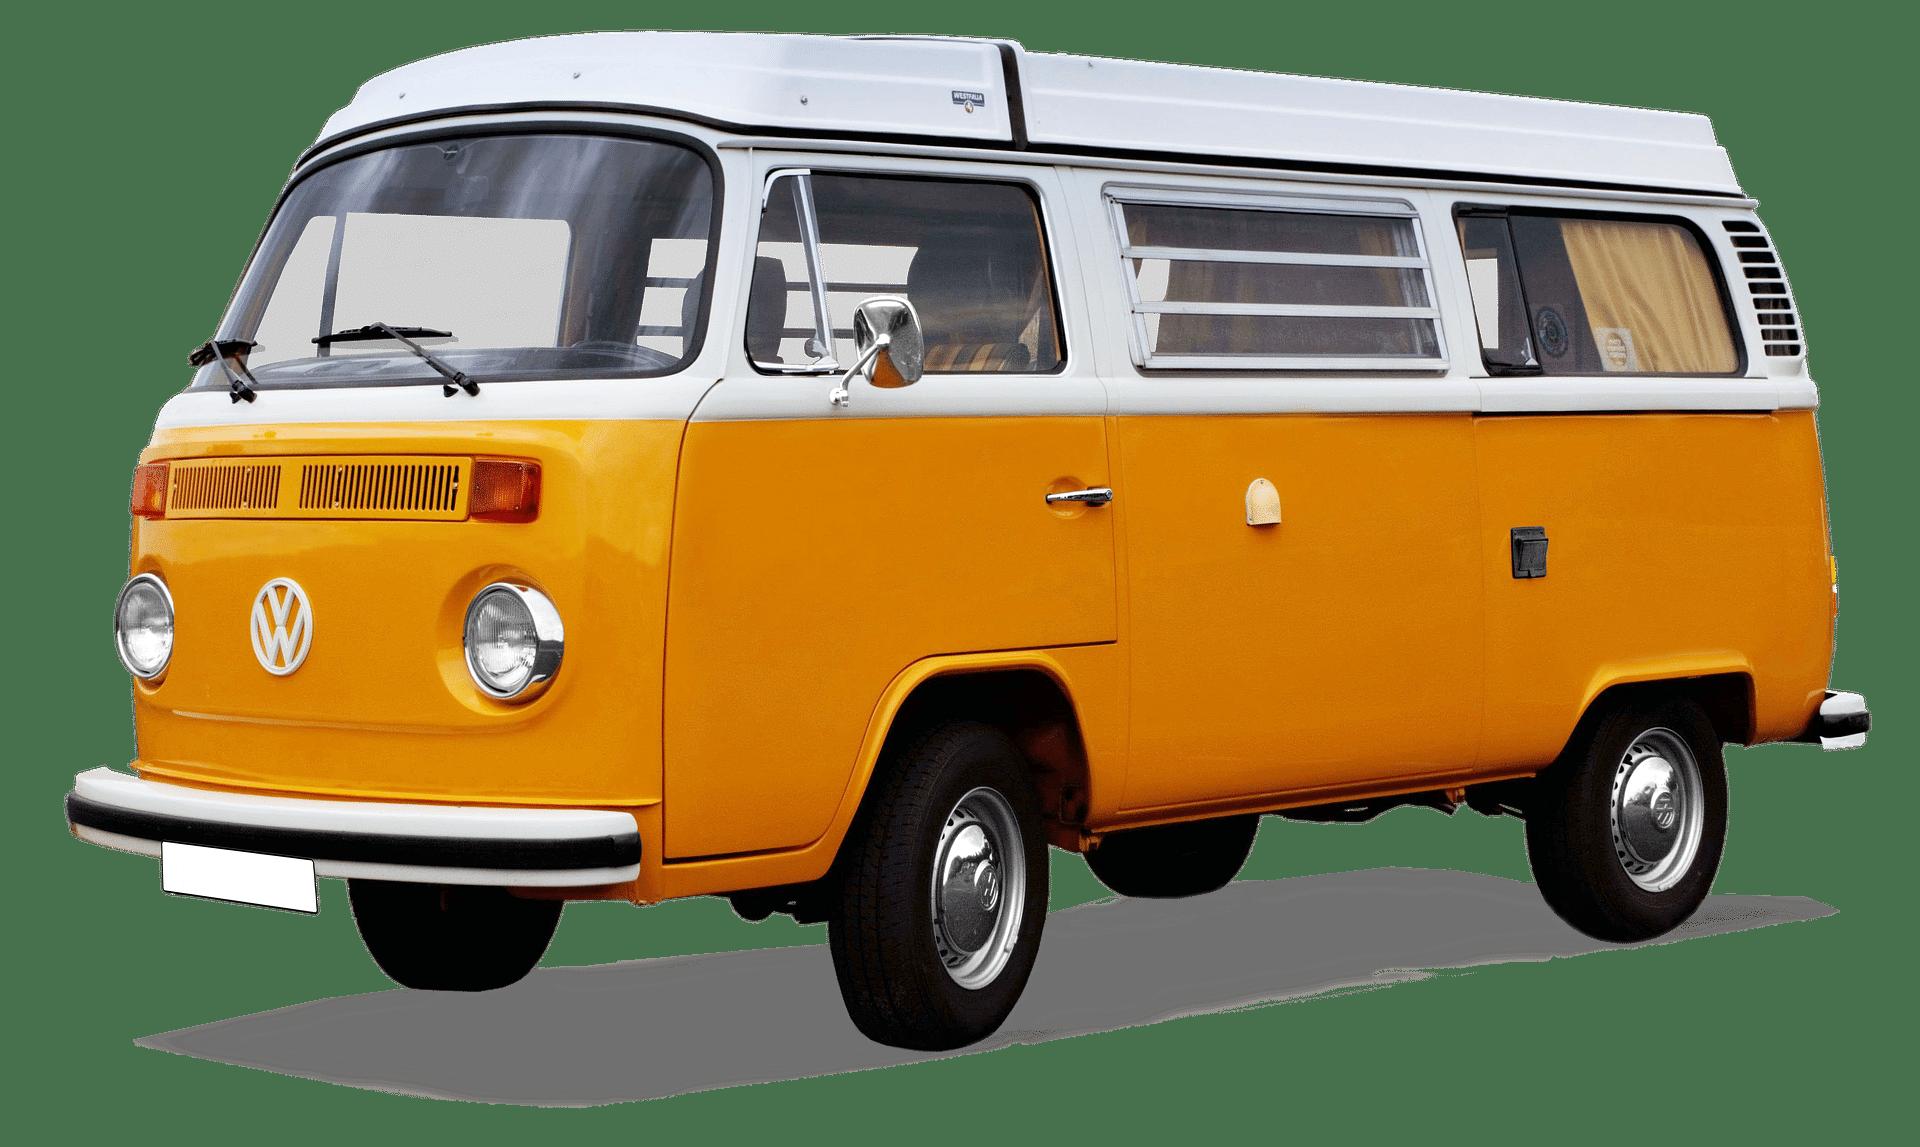 Vw Bulli 3583964 1920